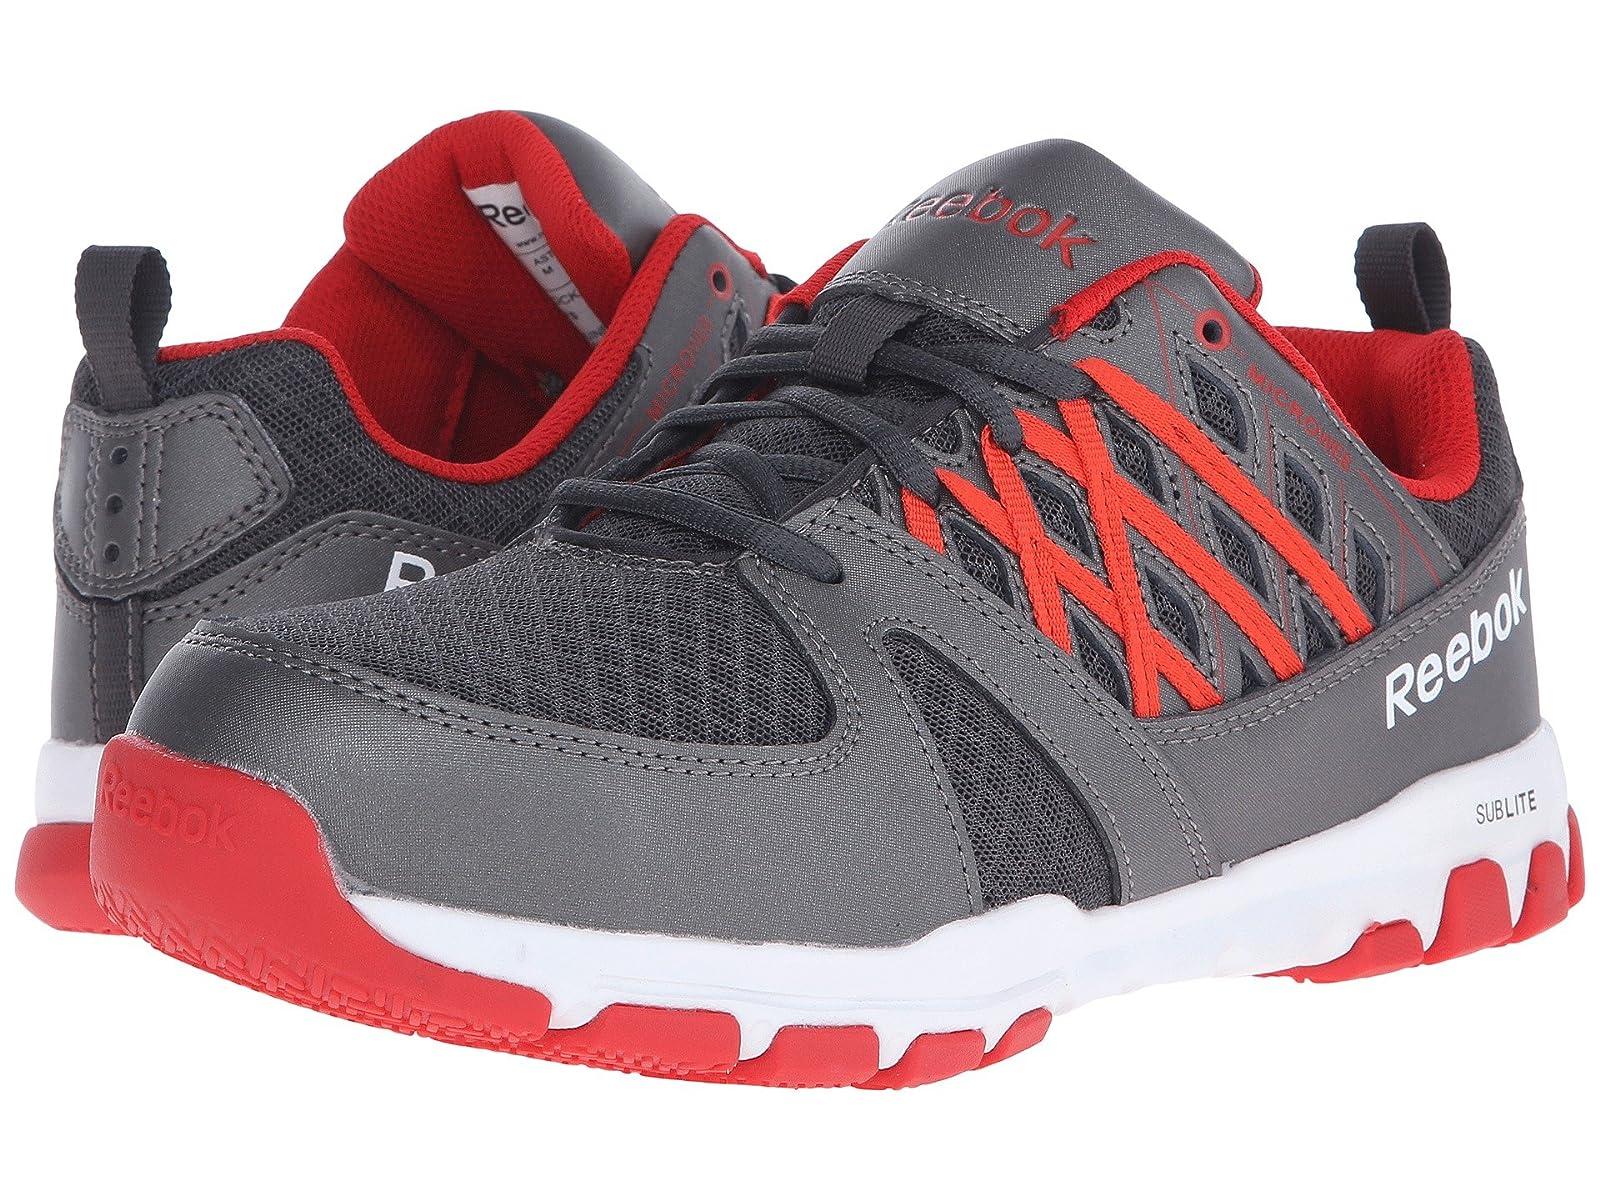 Reebok Work Sublite WorkAtmospheric grades have affordable shoes